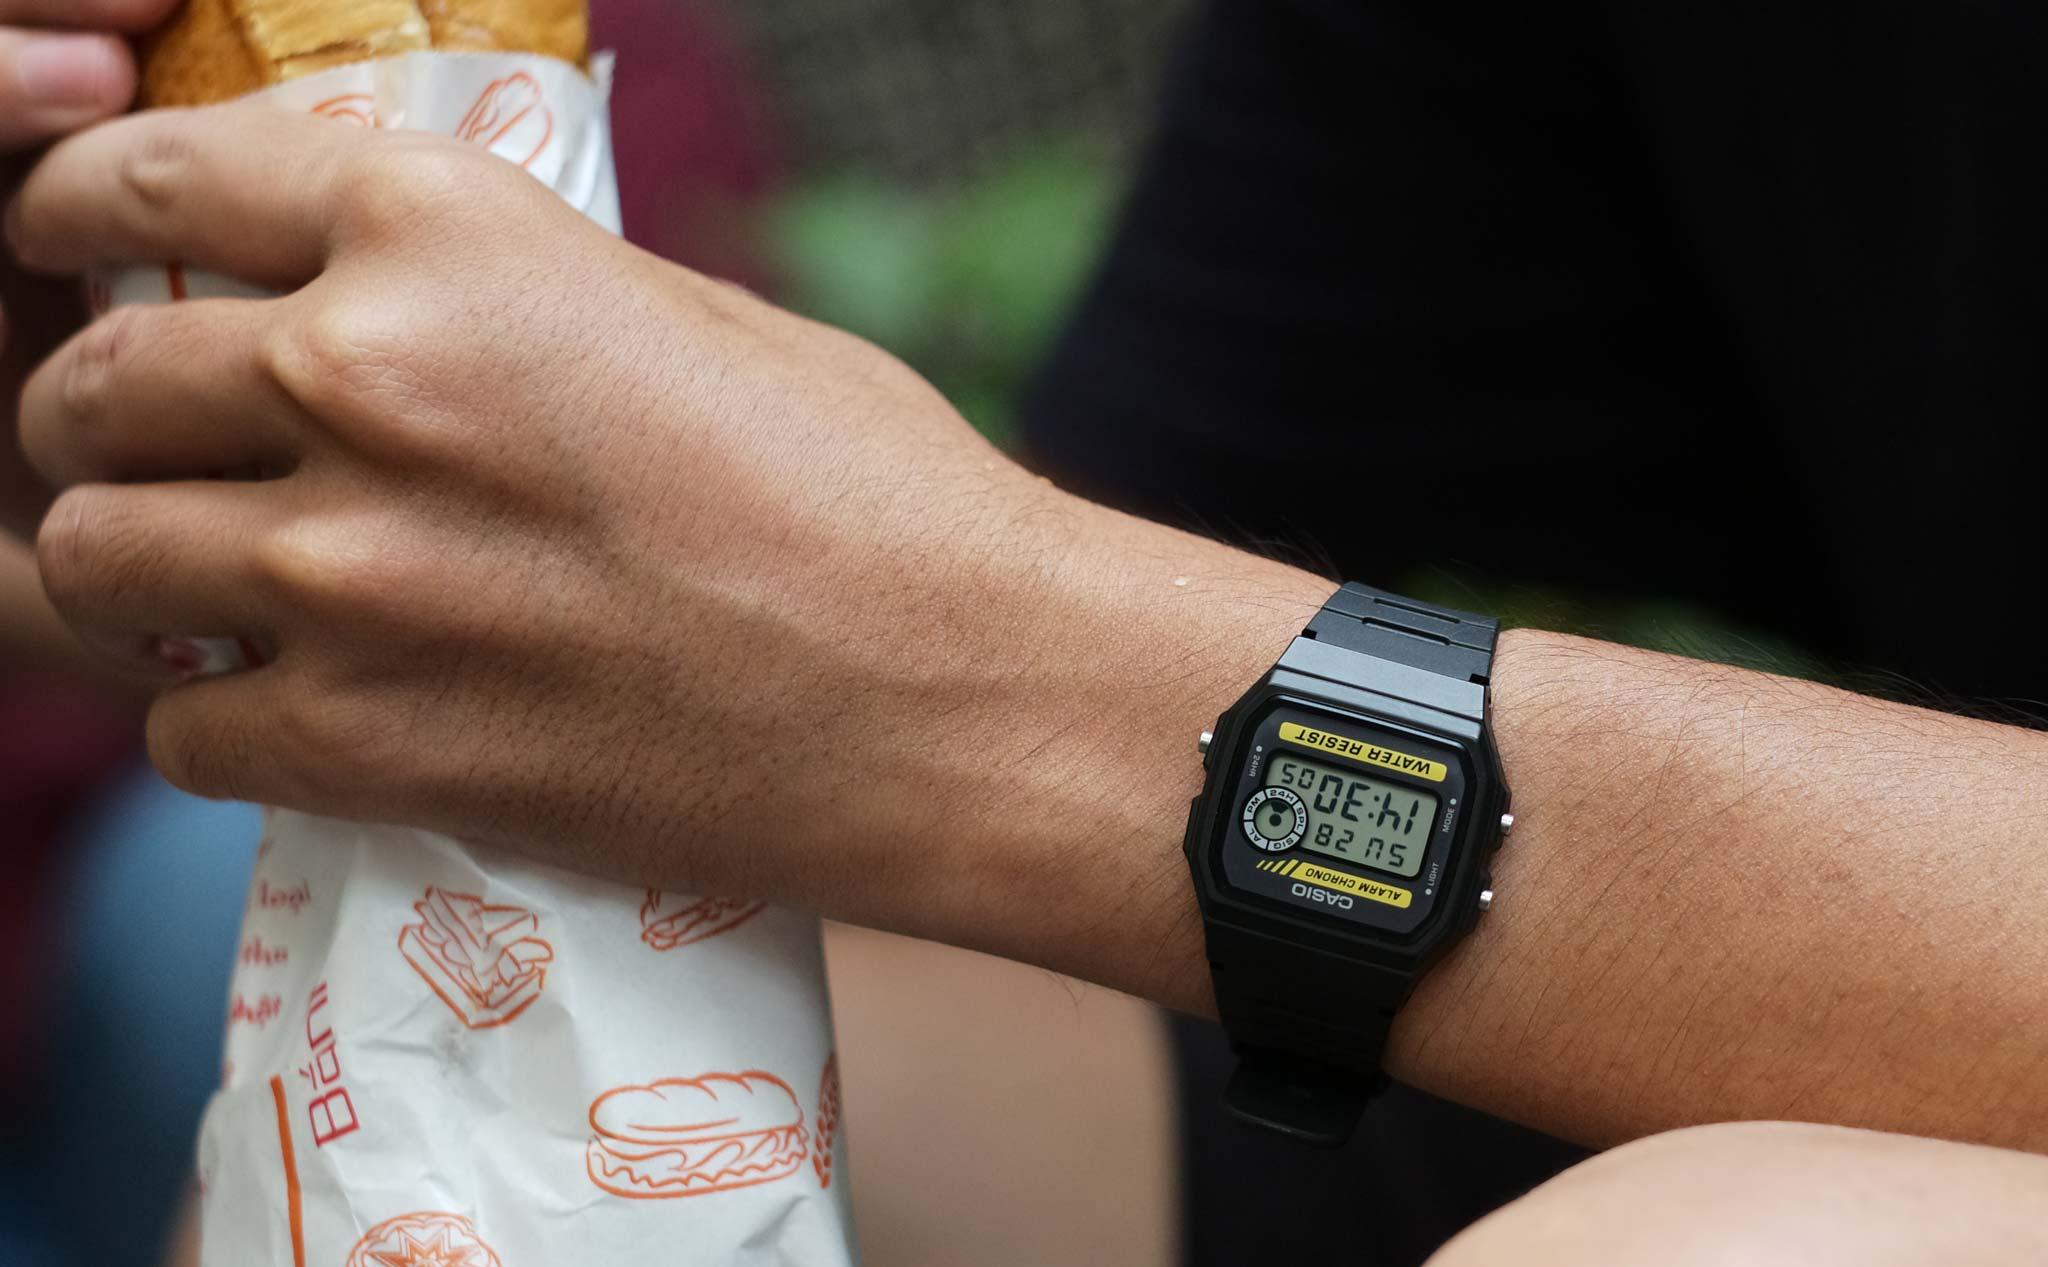 Thiết kế của đồng hồ Casio F-94W